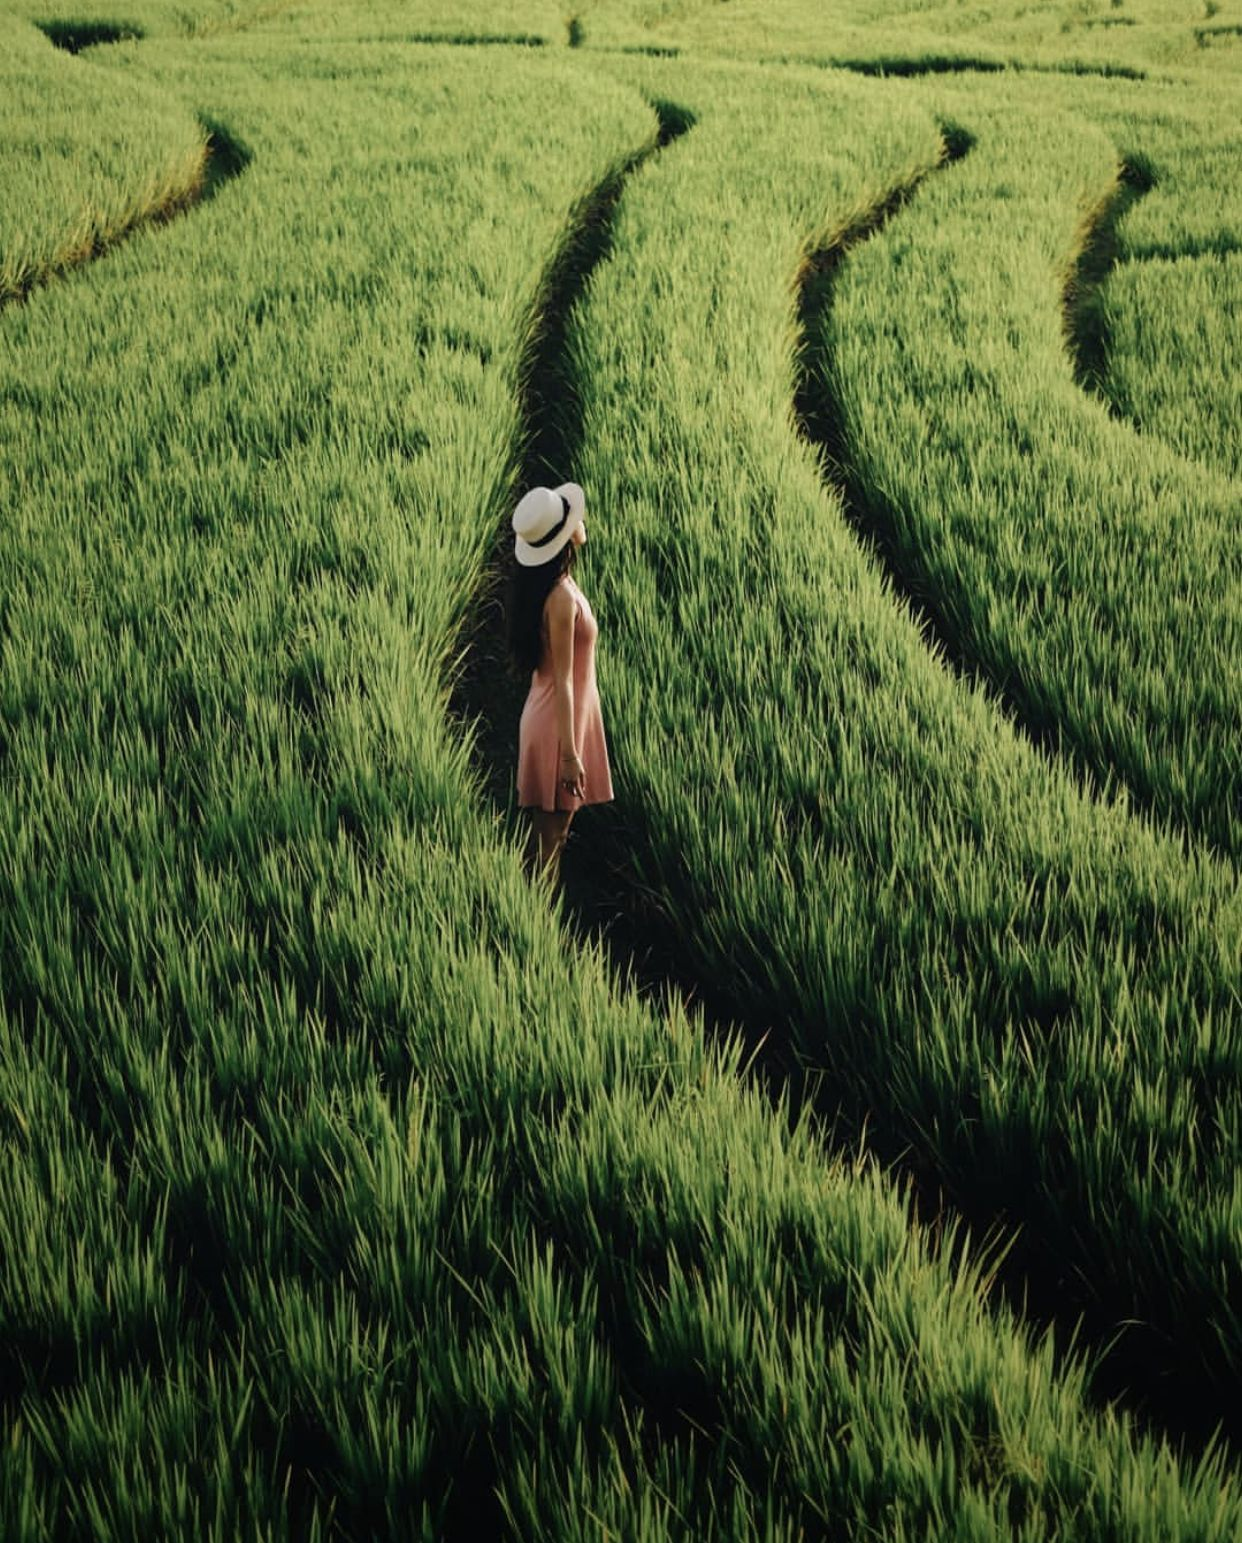 Rice Terraces in Canggu Bali in 2020 Bali travel